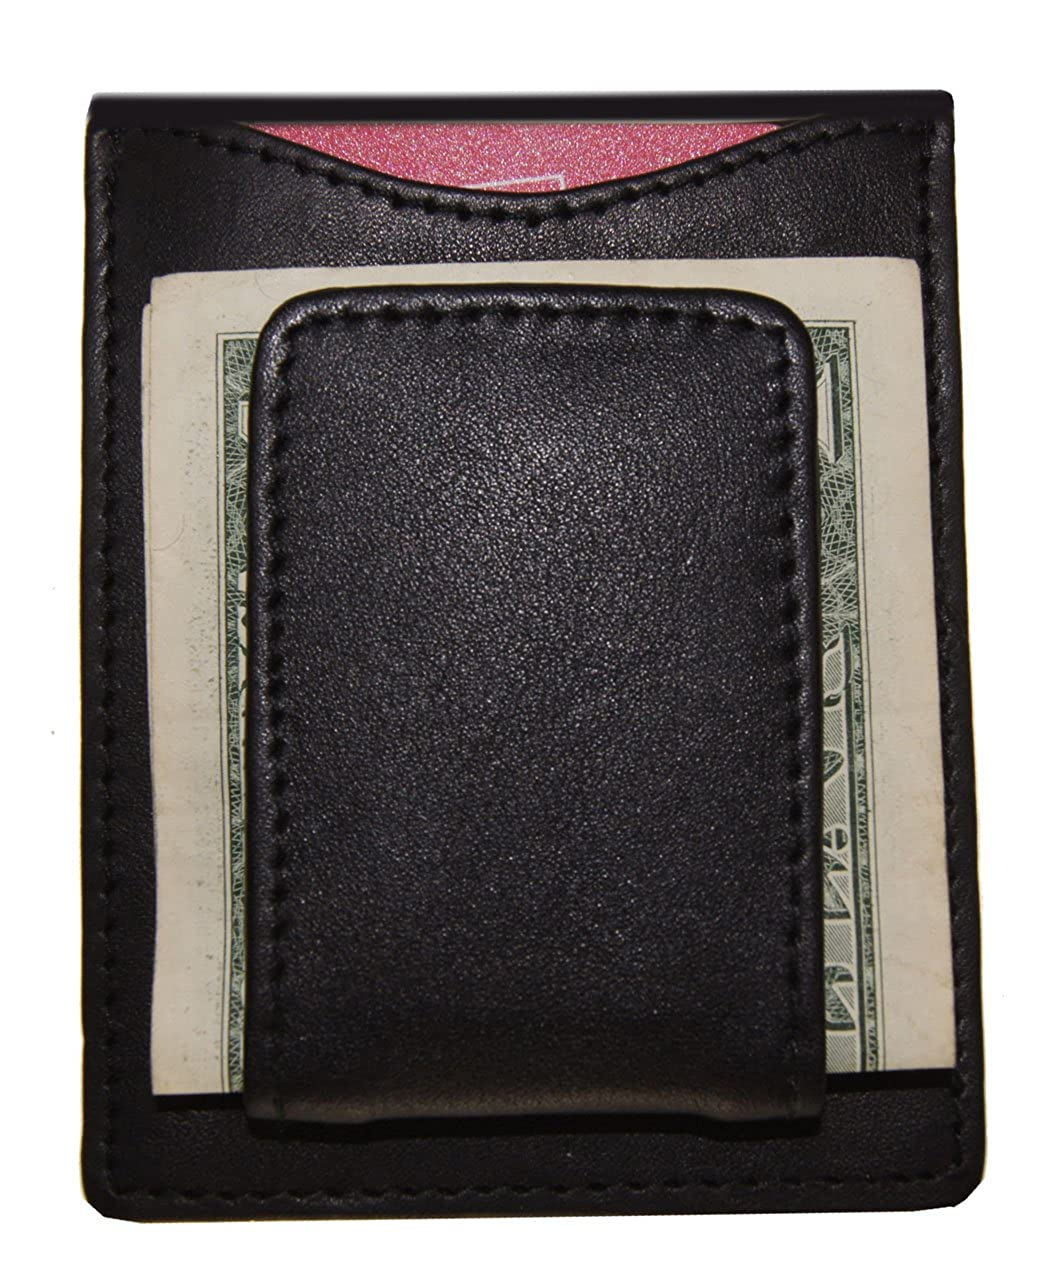 Black AG Wallets Mens Simple Magnet Money Clip Wallets